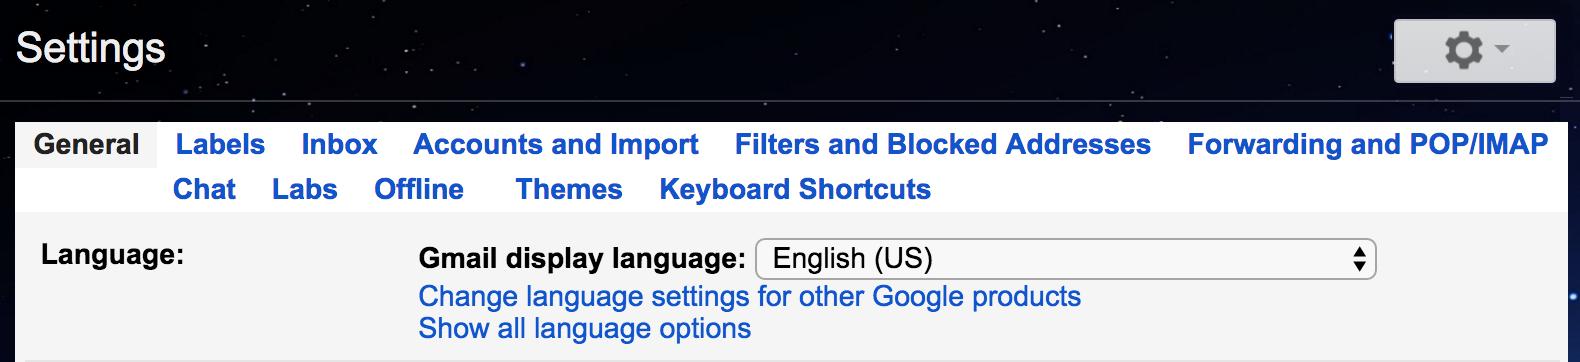 gmail settings menu options